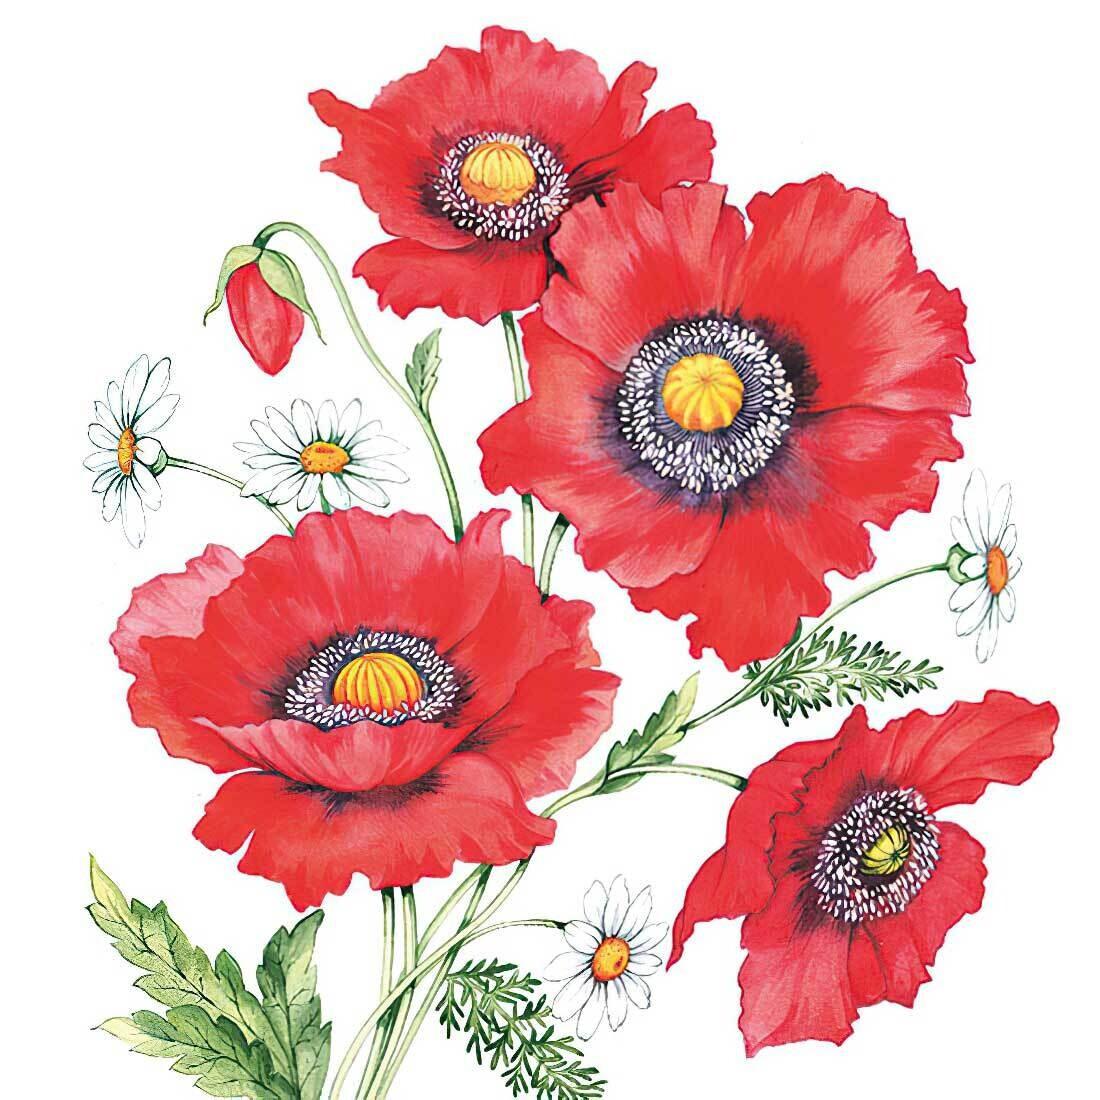 Decoupage Paper Napkins - Floral - Poppy Scene (1 Sheet)